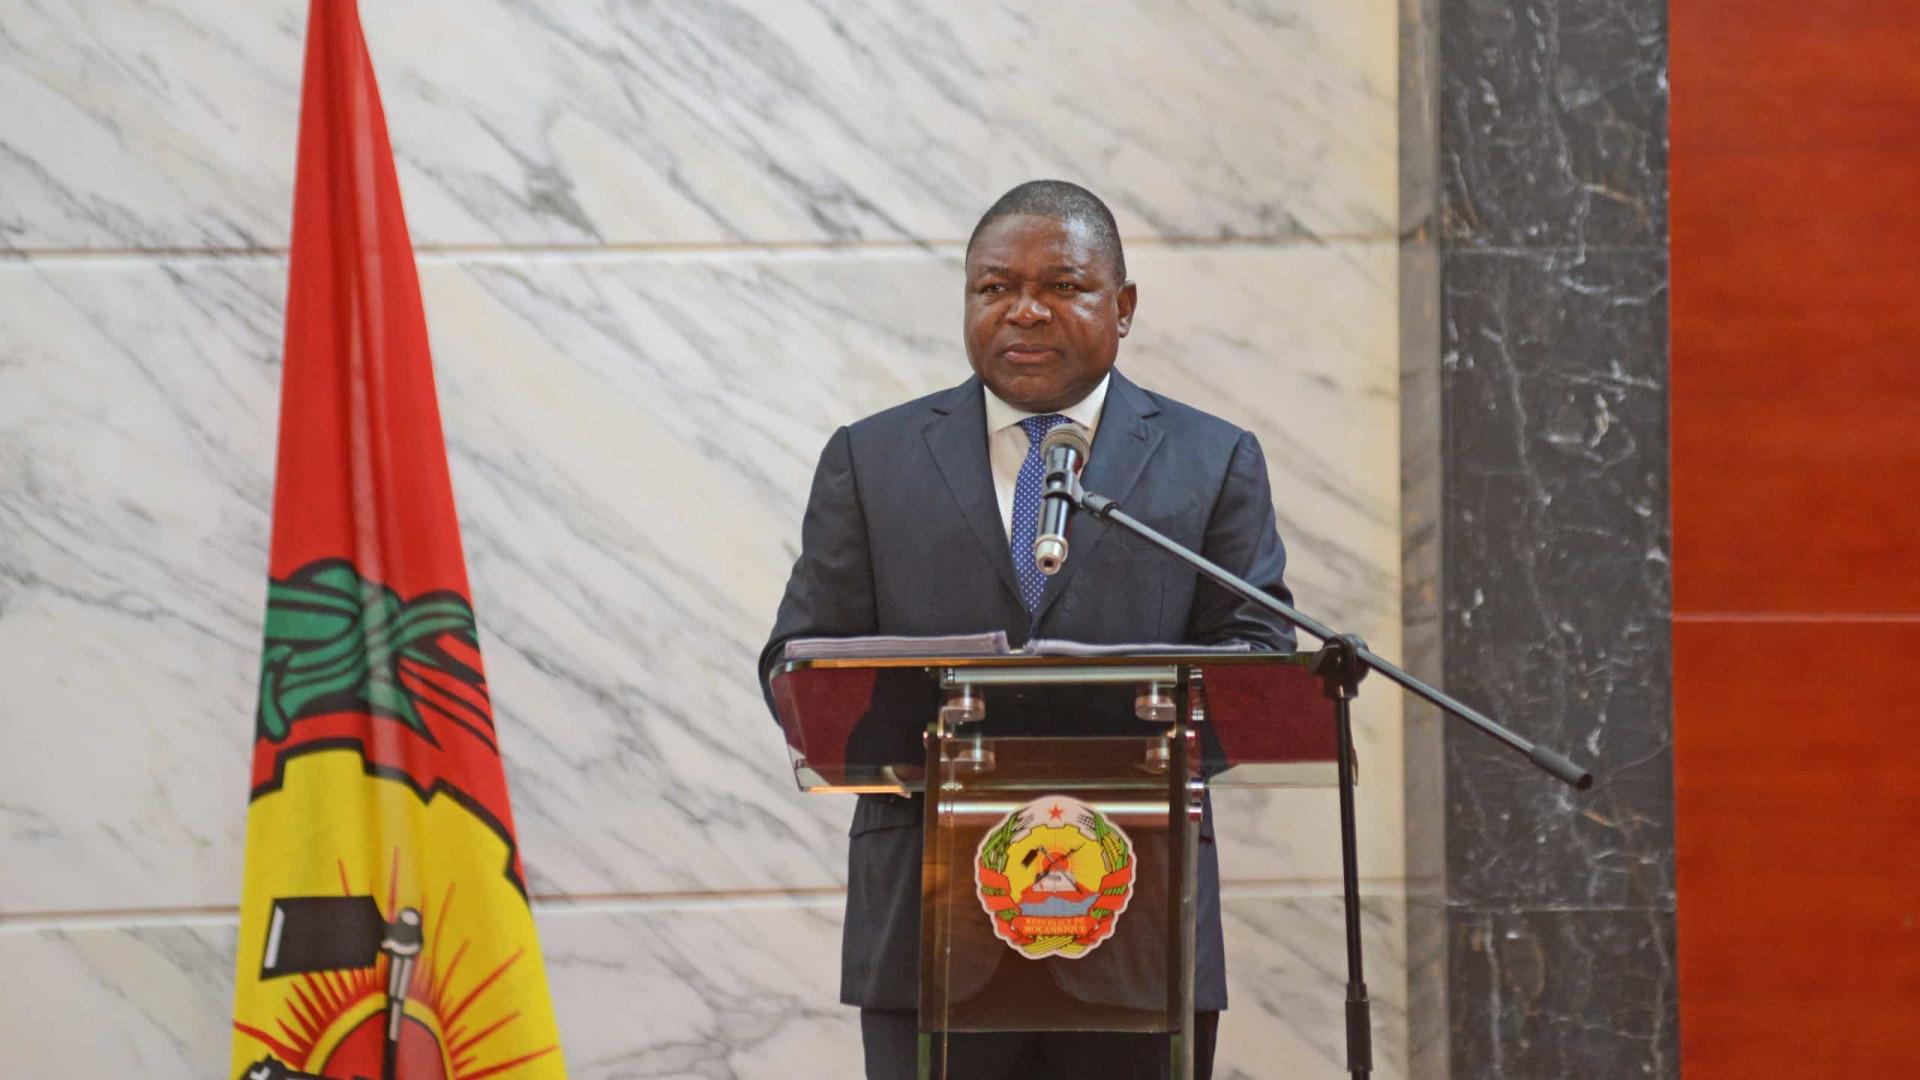 Governo e Renamo finalizam acordo para reintegrar antigos guerrilheiros